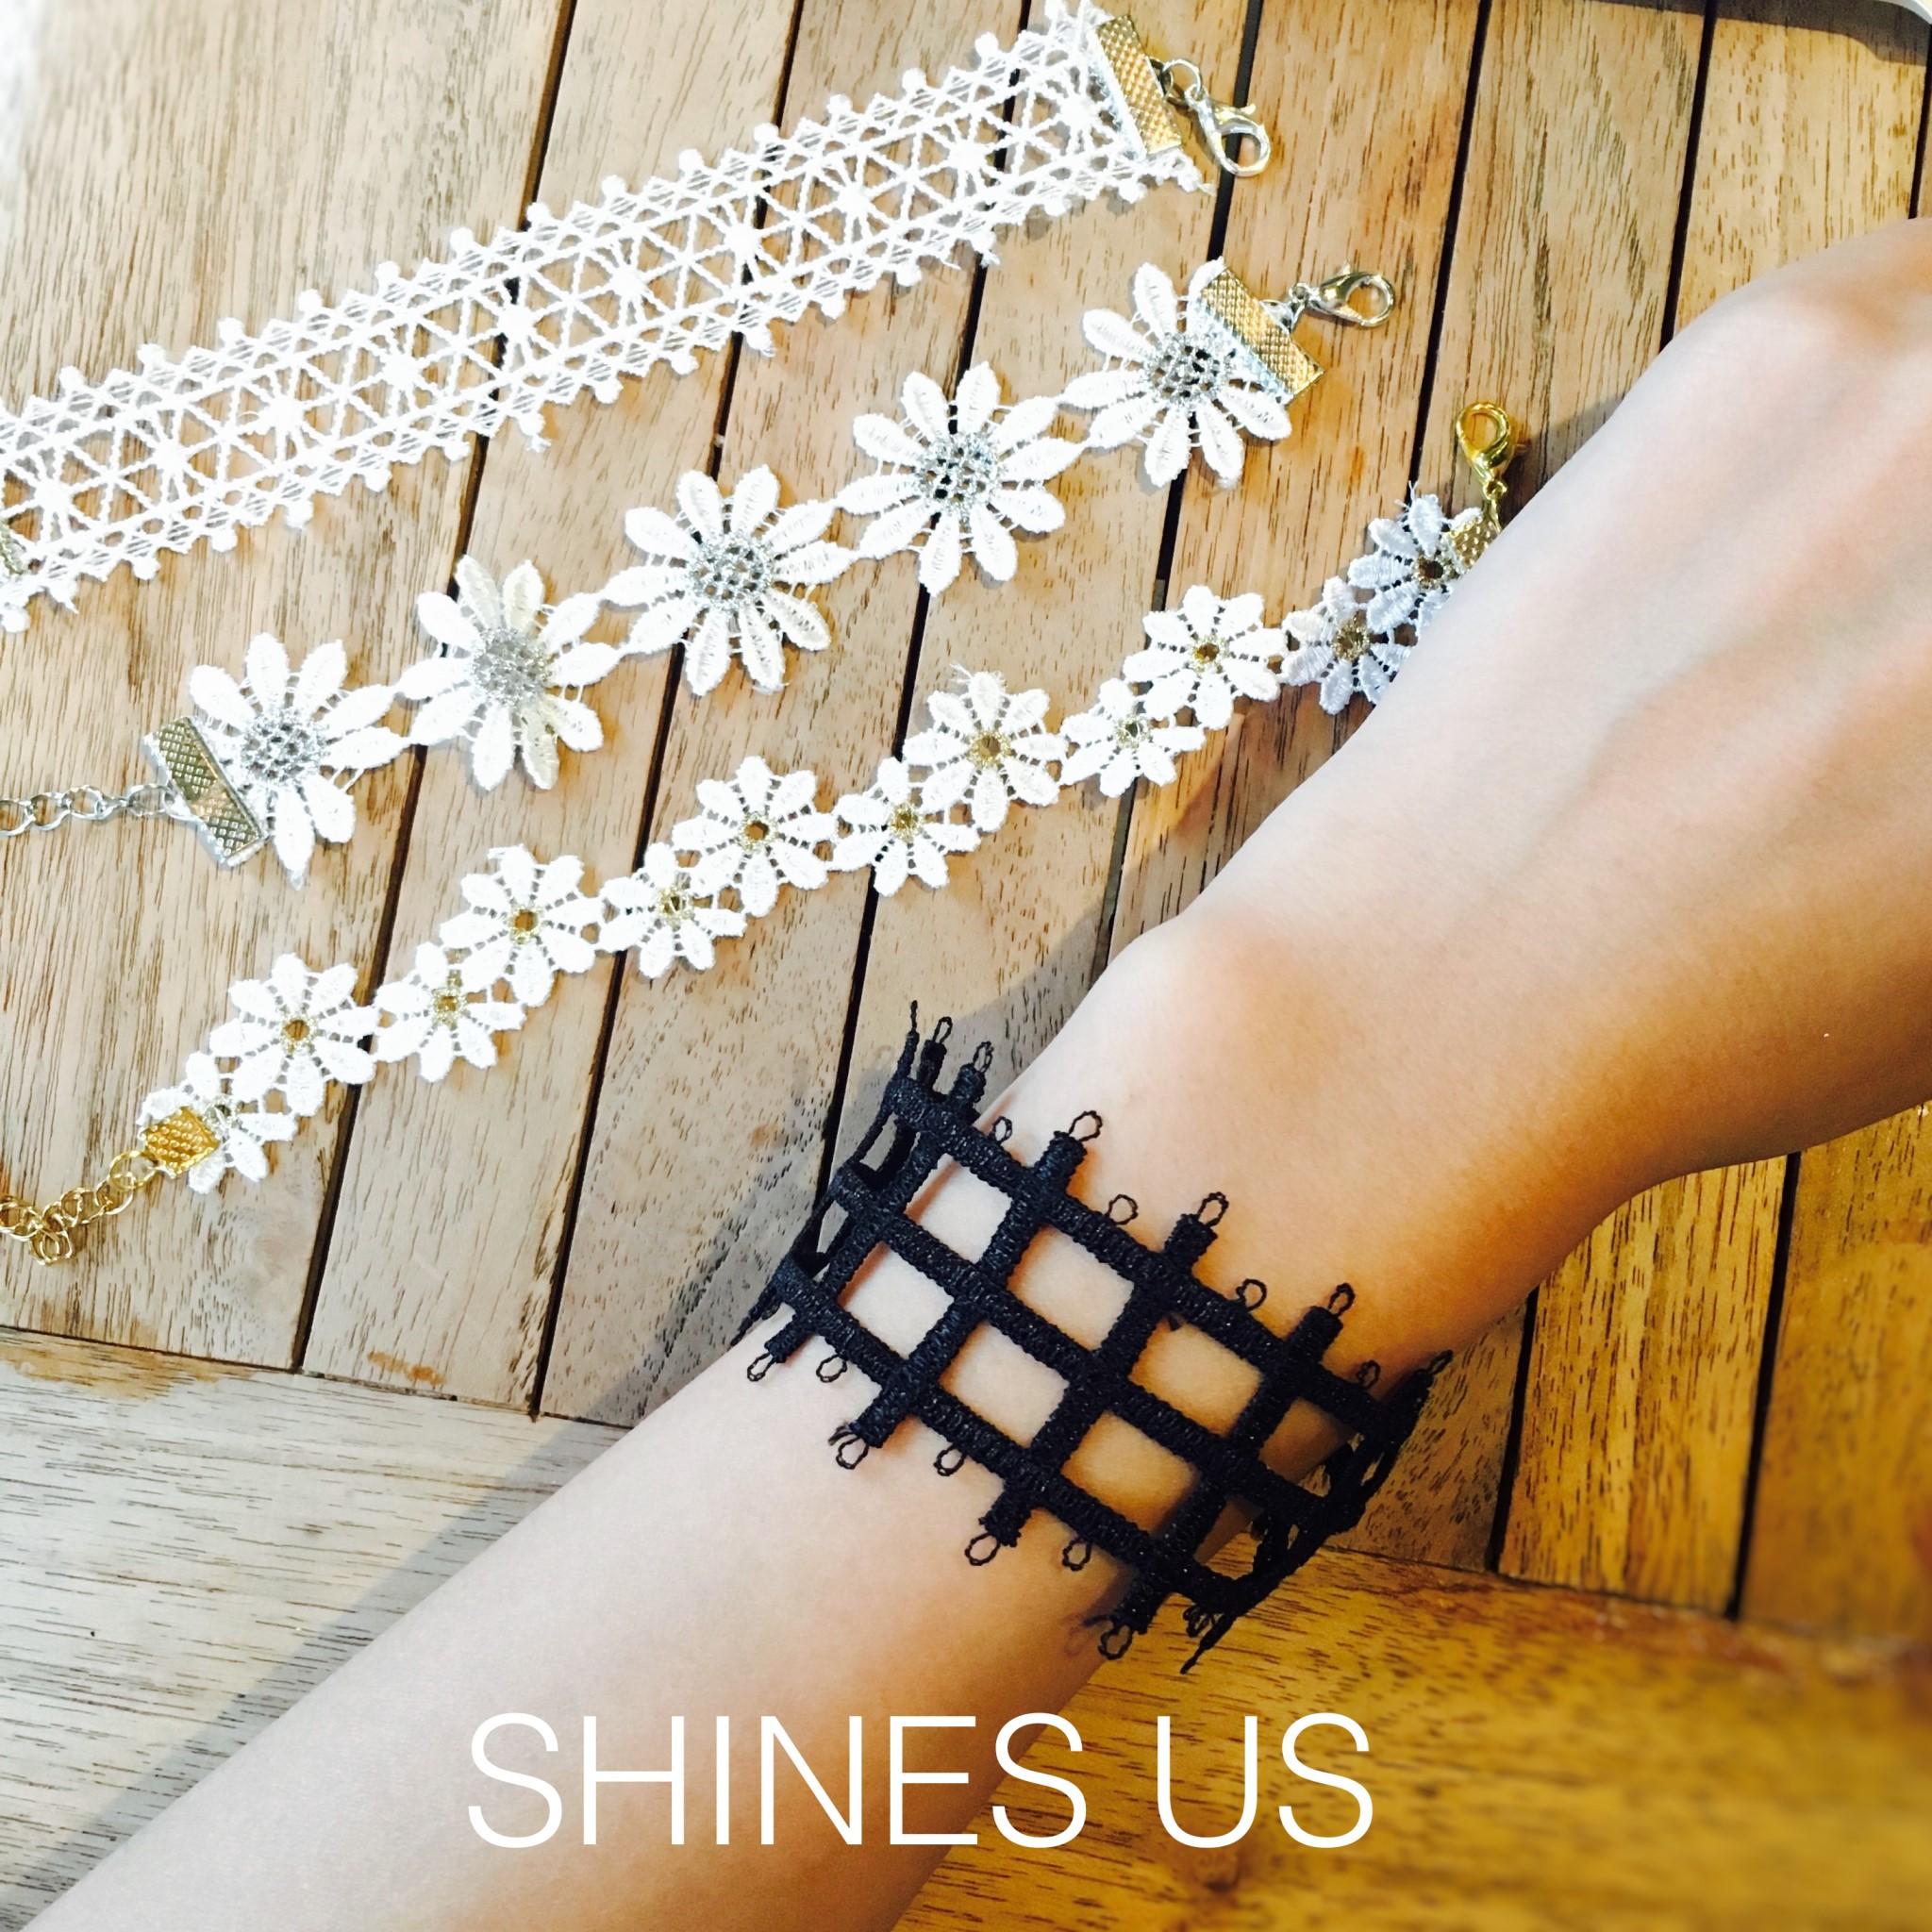 【SHINES US】正韓 蕾絲當道手環(4款)手鍊手環